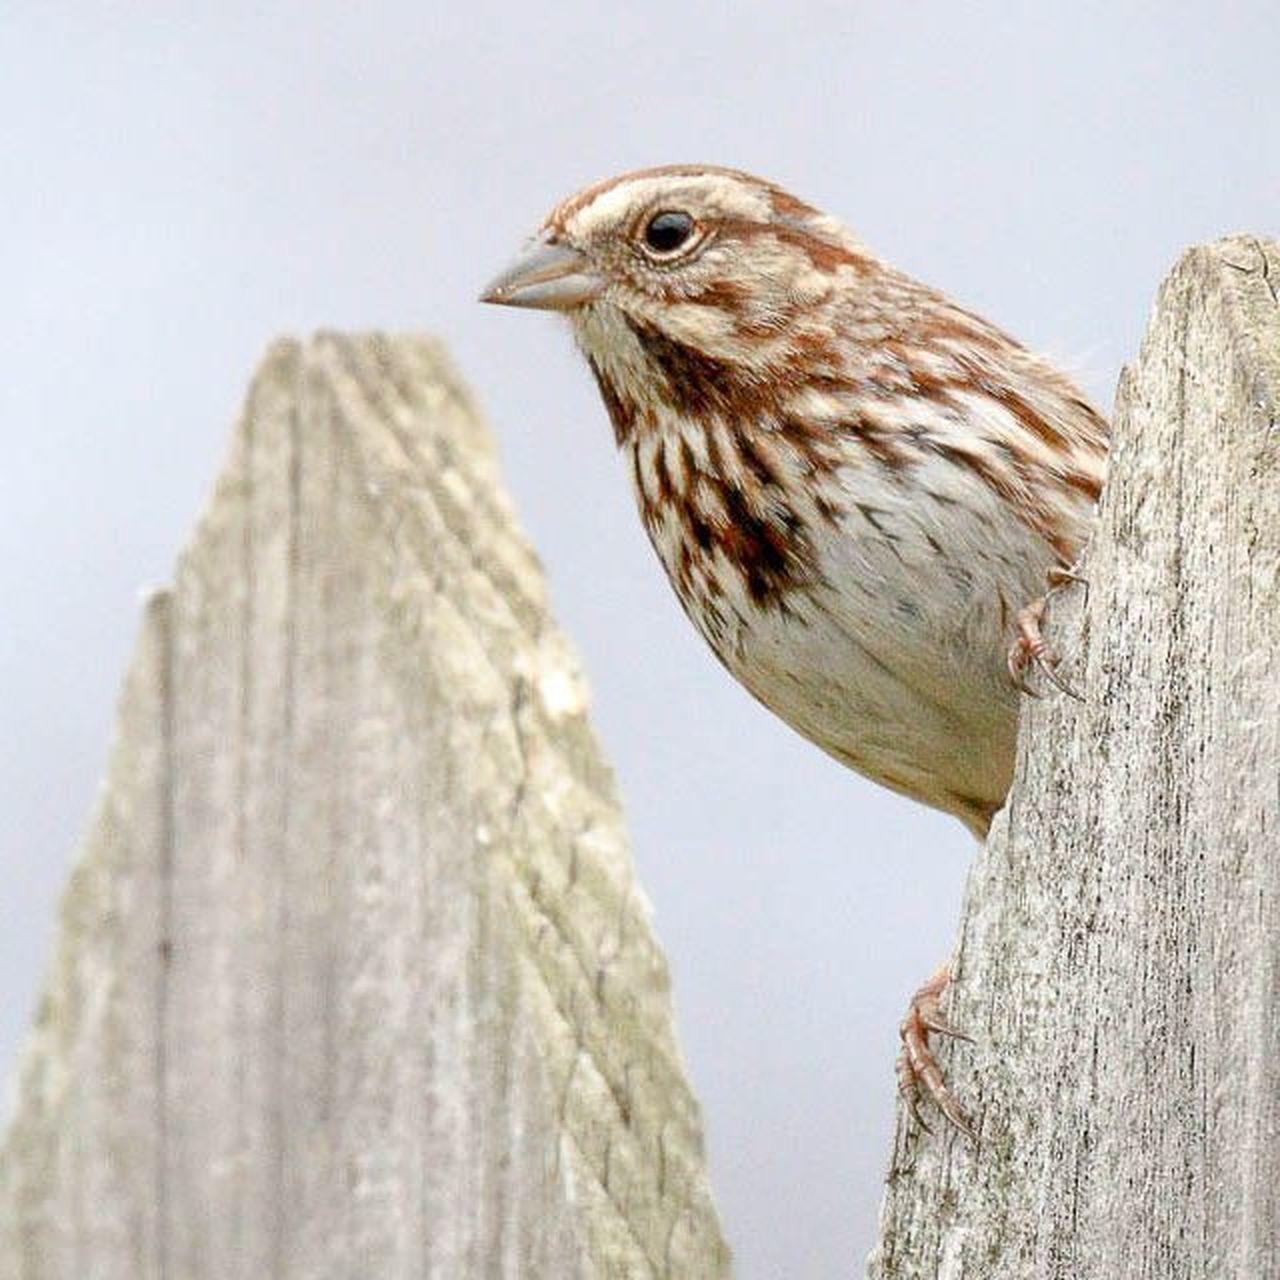 Got a Songsparrow hanging around my yard lately 😎 Backyardwildlife Sparrows Ig_discover_wildlife Backyardbirds Birdingphotography Nature Birdsofinstagram Ig_discover_birdslife Kings_birds